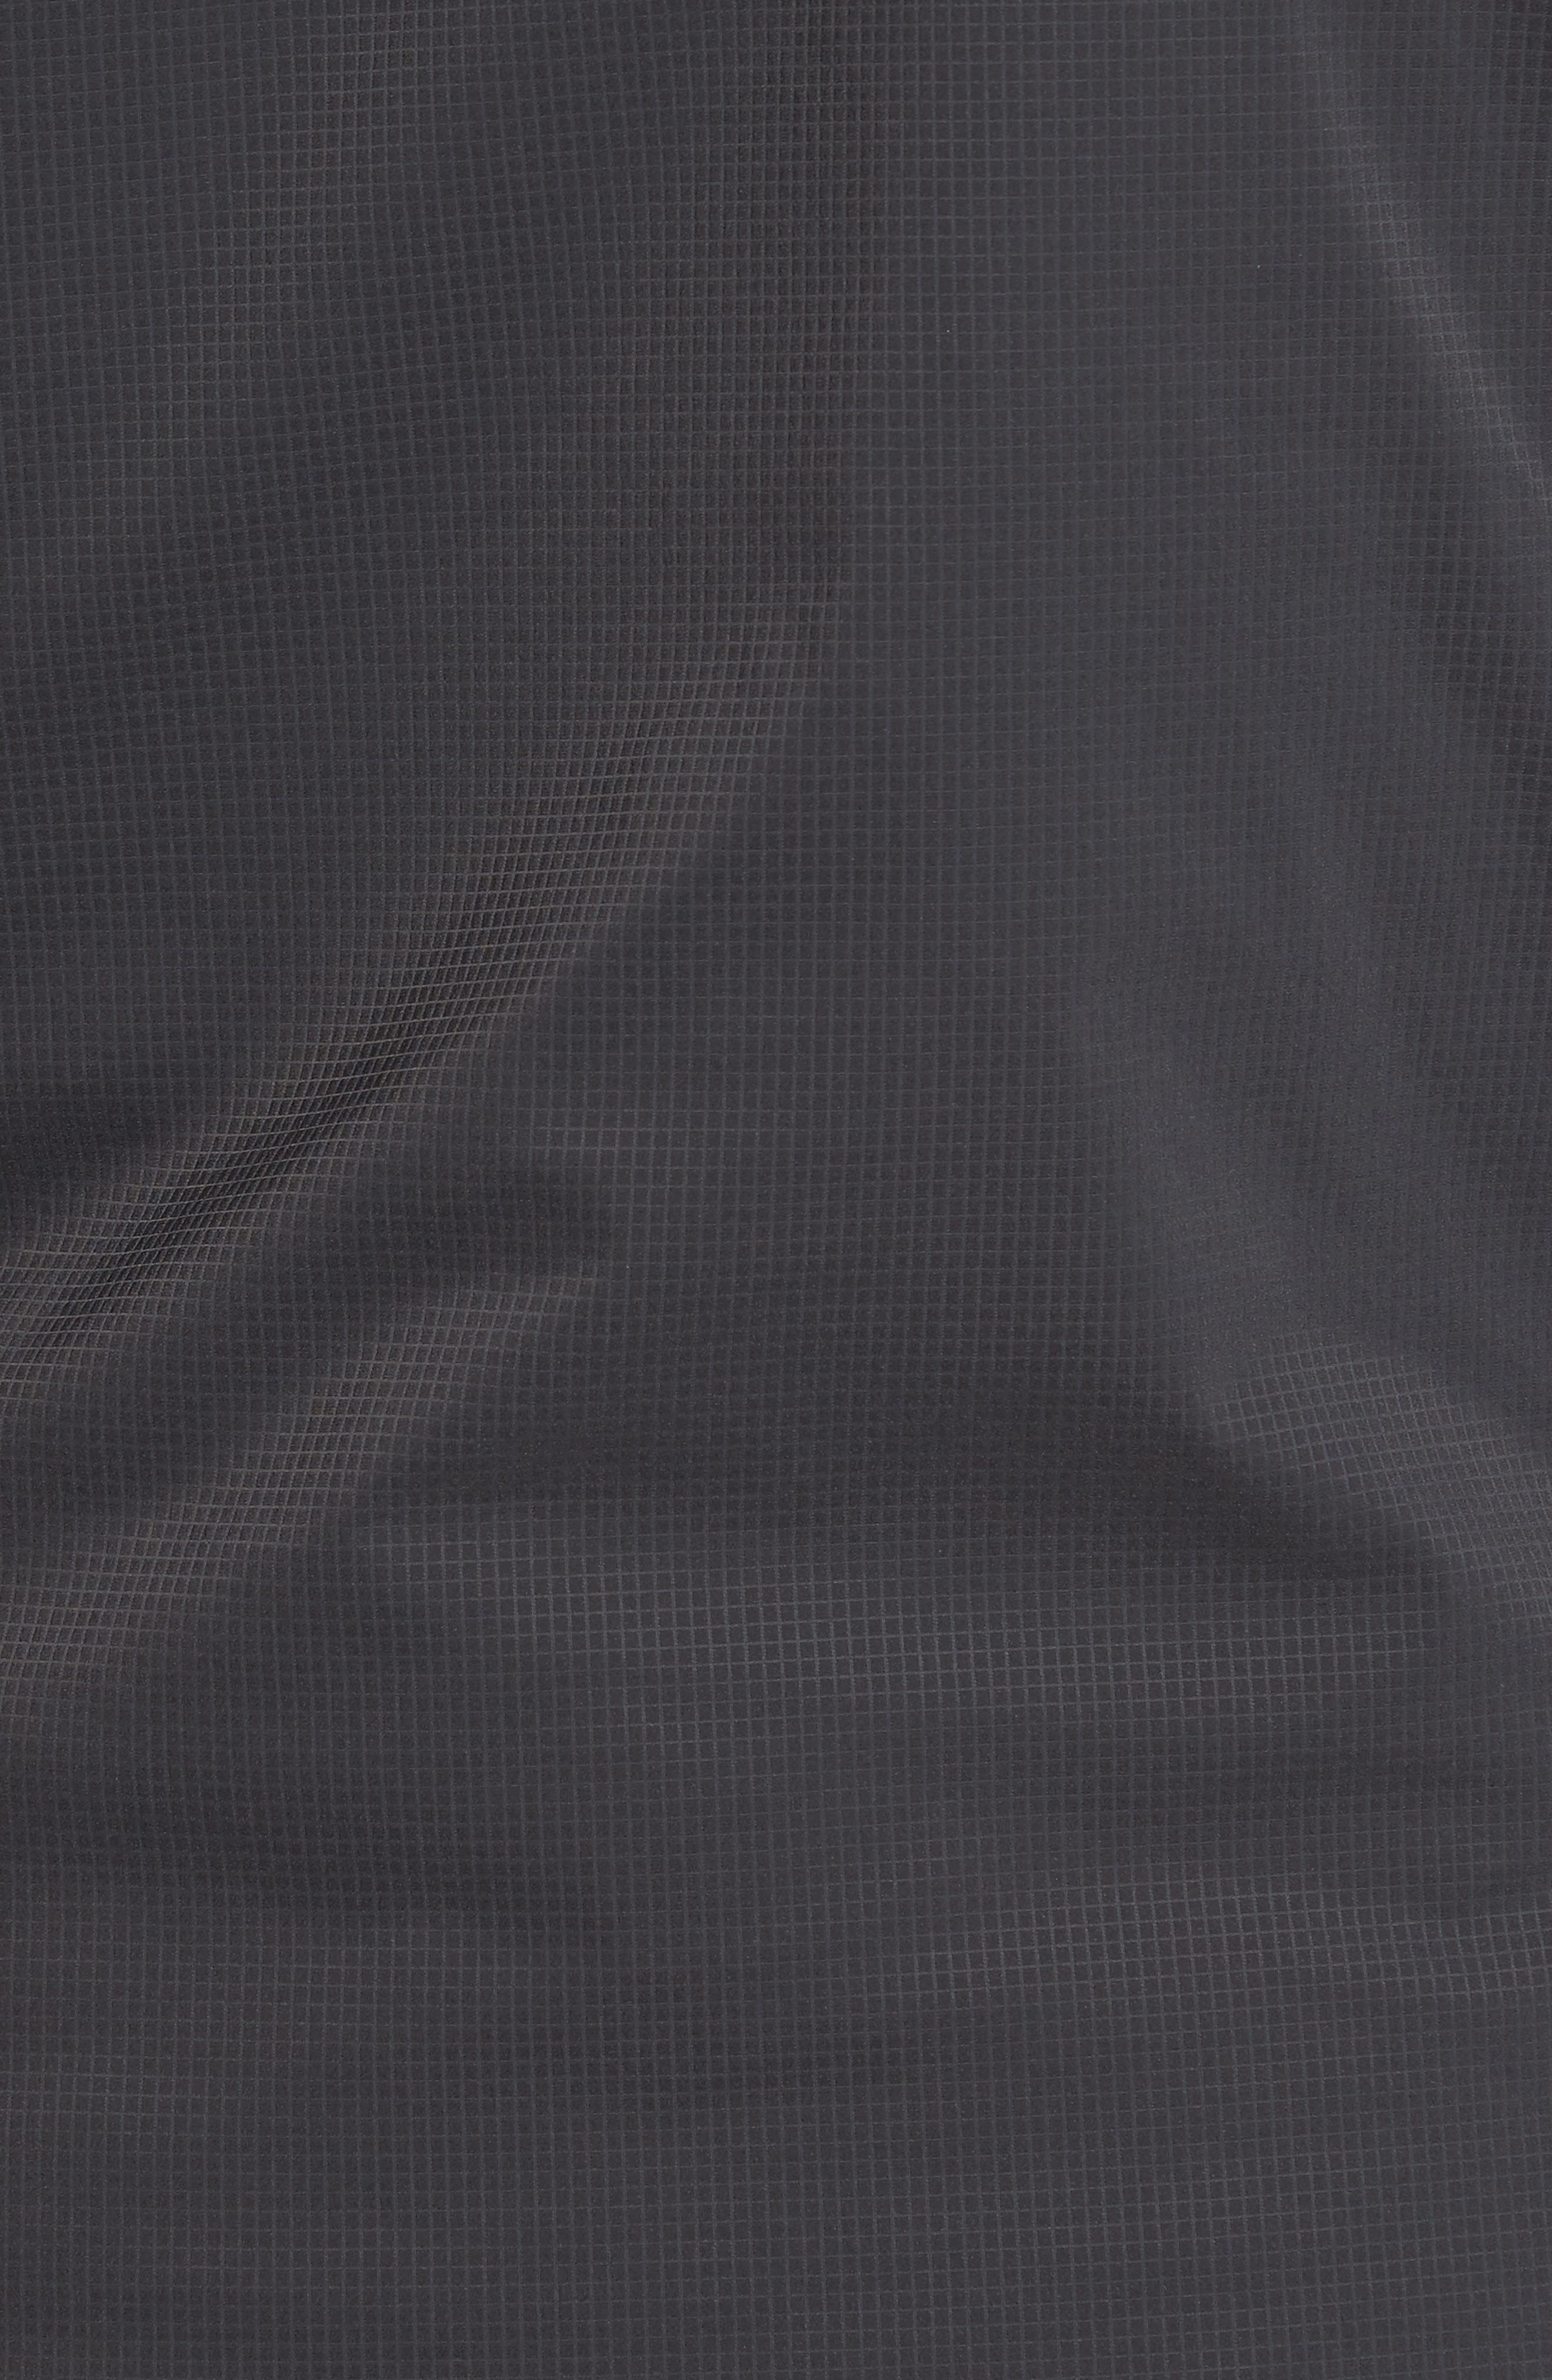 Ventrix Water Resistant Ripstop Jacket,                             Alternate thumbnail 6, color,                             ASPHALT GREY / ACID YELLOW